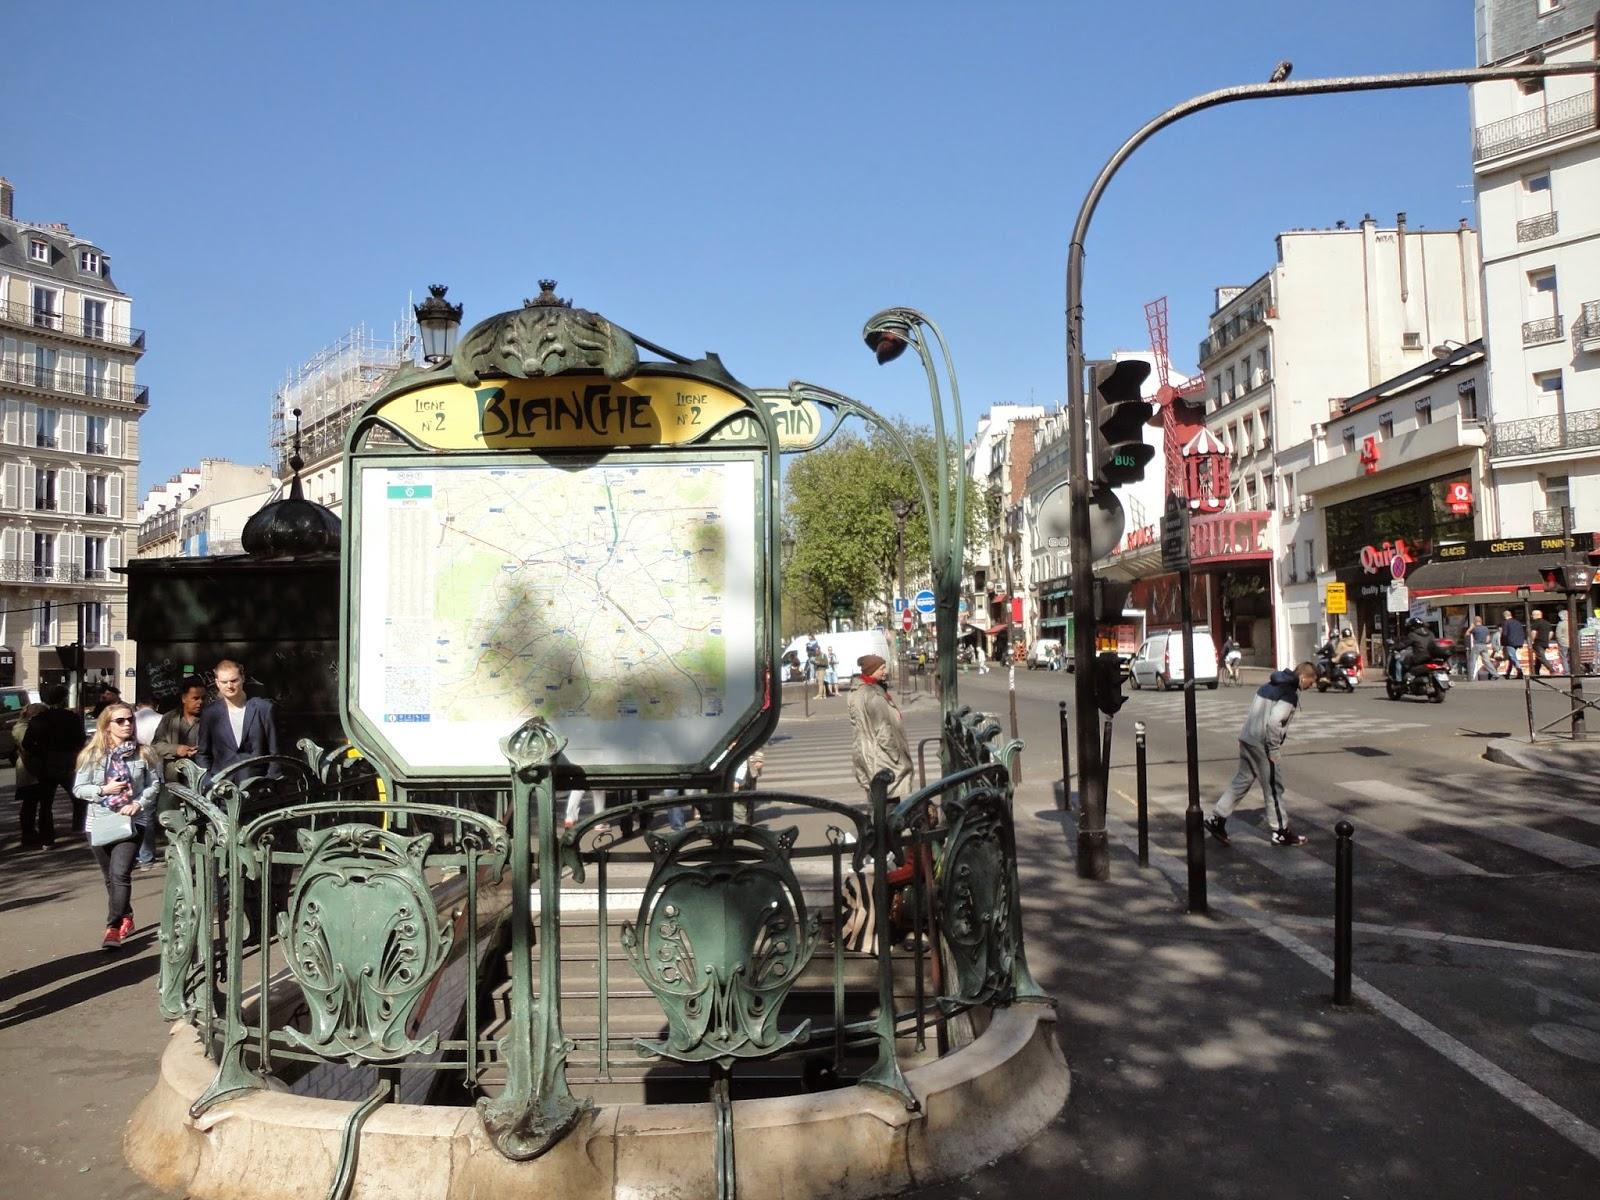 blanche-metro-paris-gary-j-byrnes